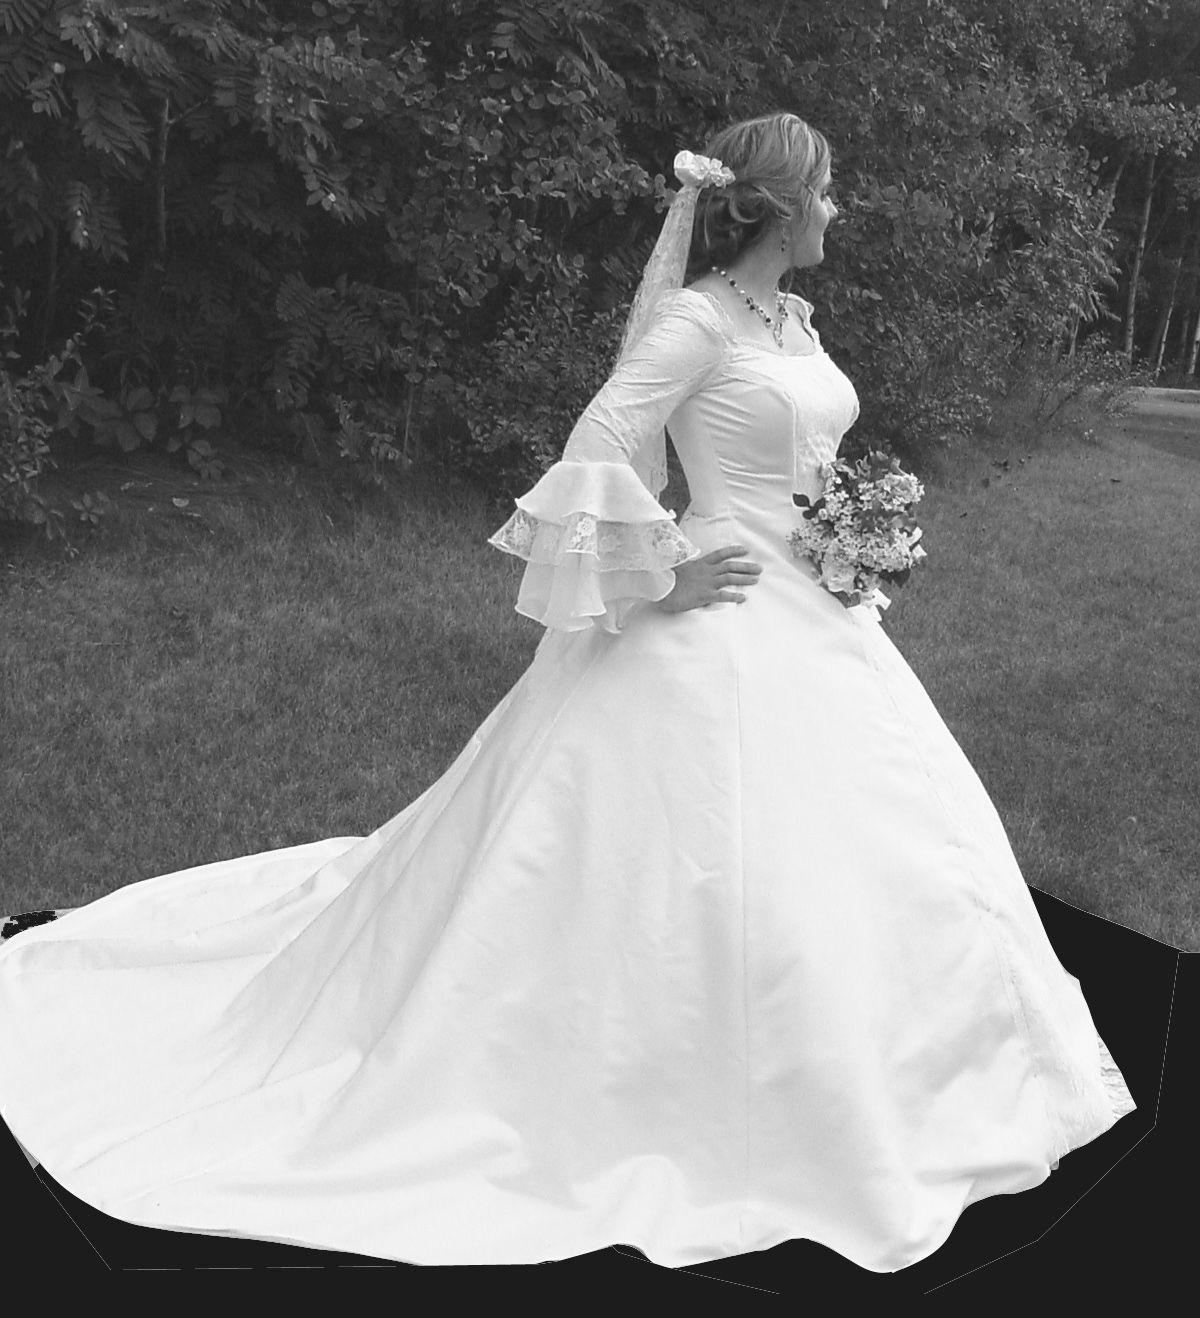 Western Wedding Dresses Country style wedding